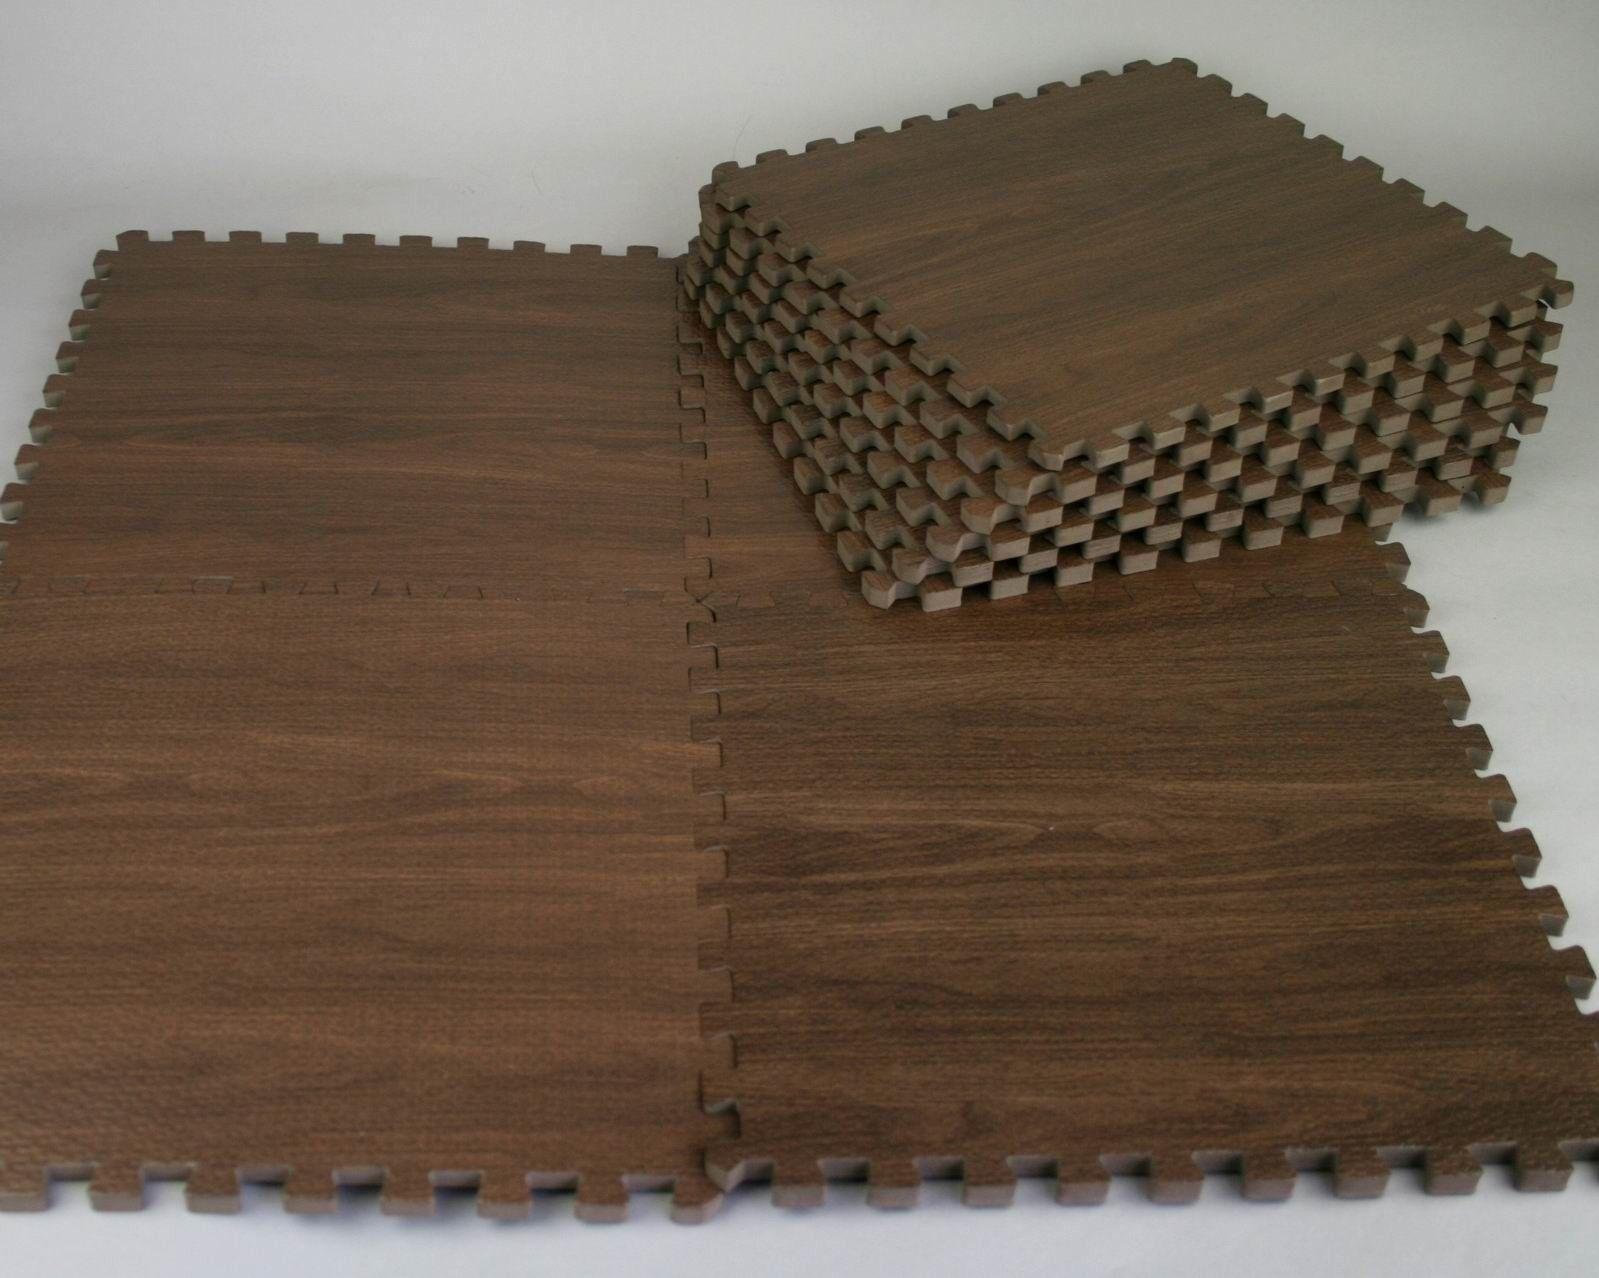 bed dp mat foam dark folding floor fold mats com grey home ottoman tri amazon kitchen